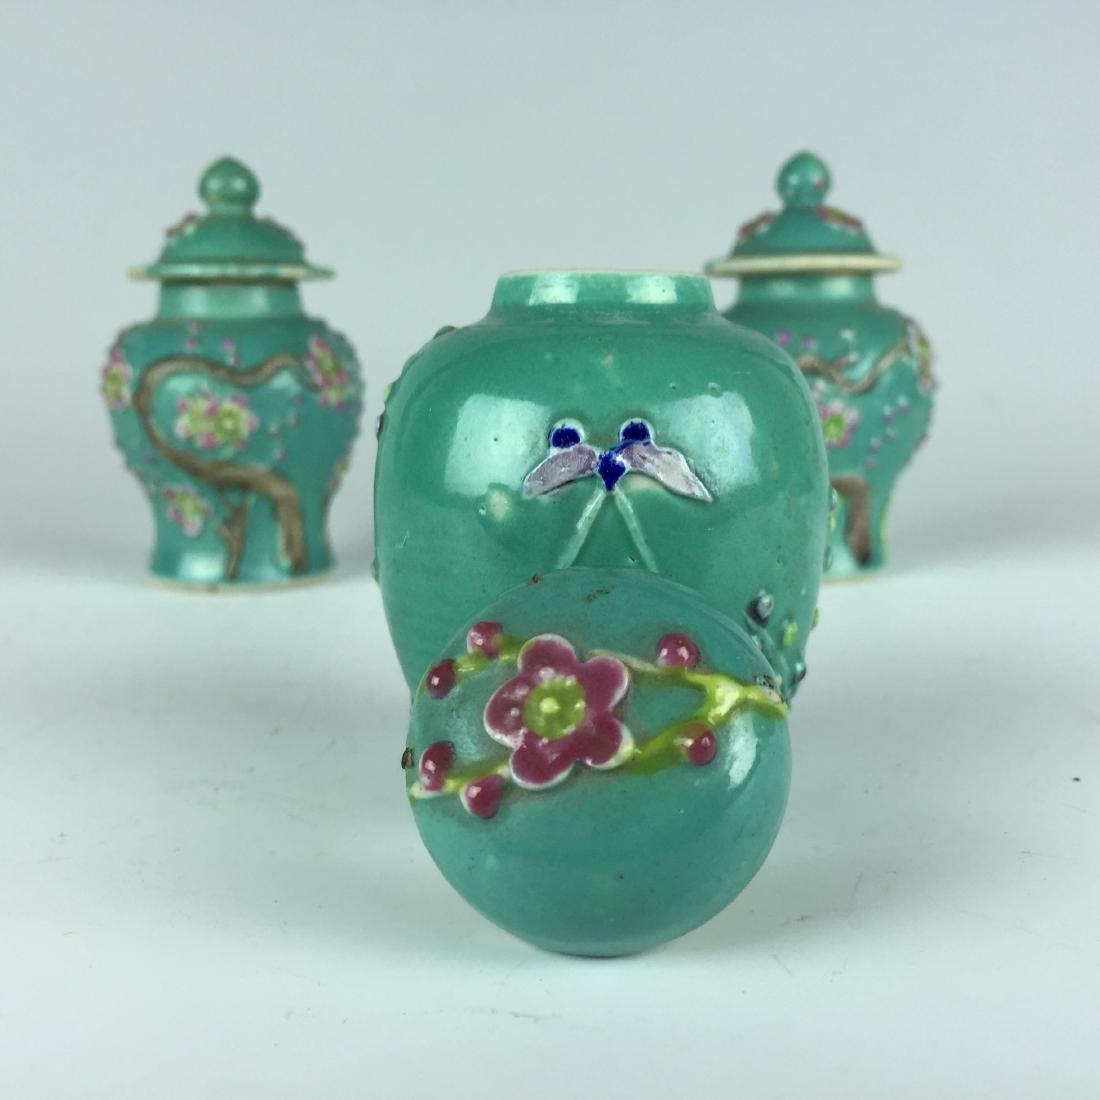 Chinese Porcelain Jar and Pot set - 4